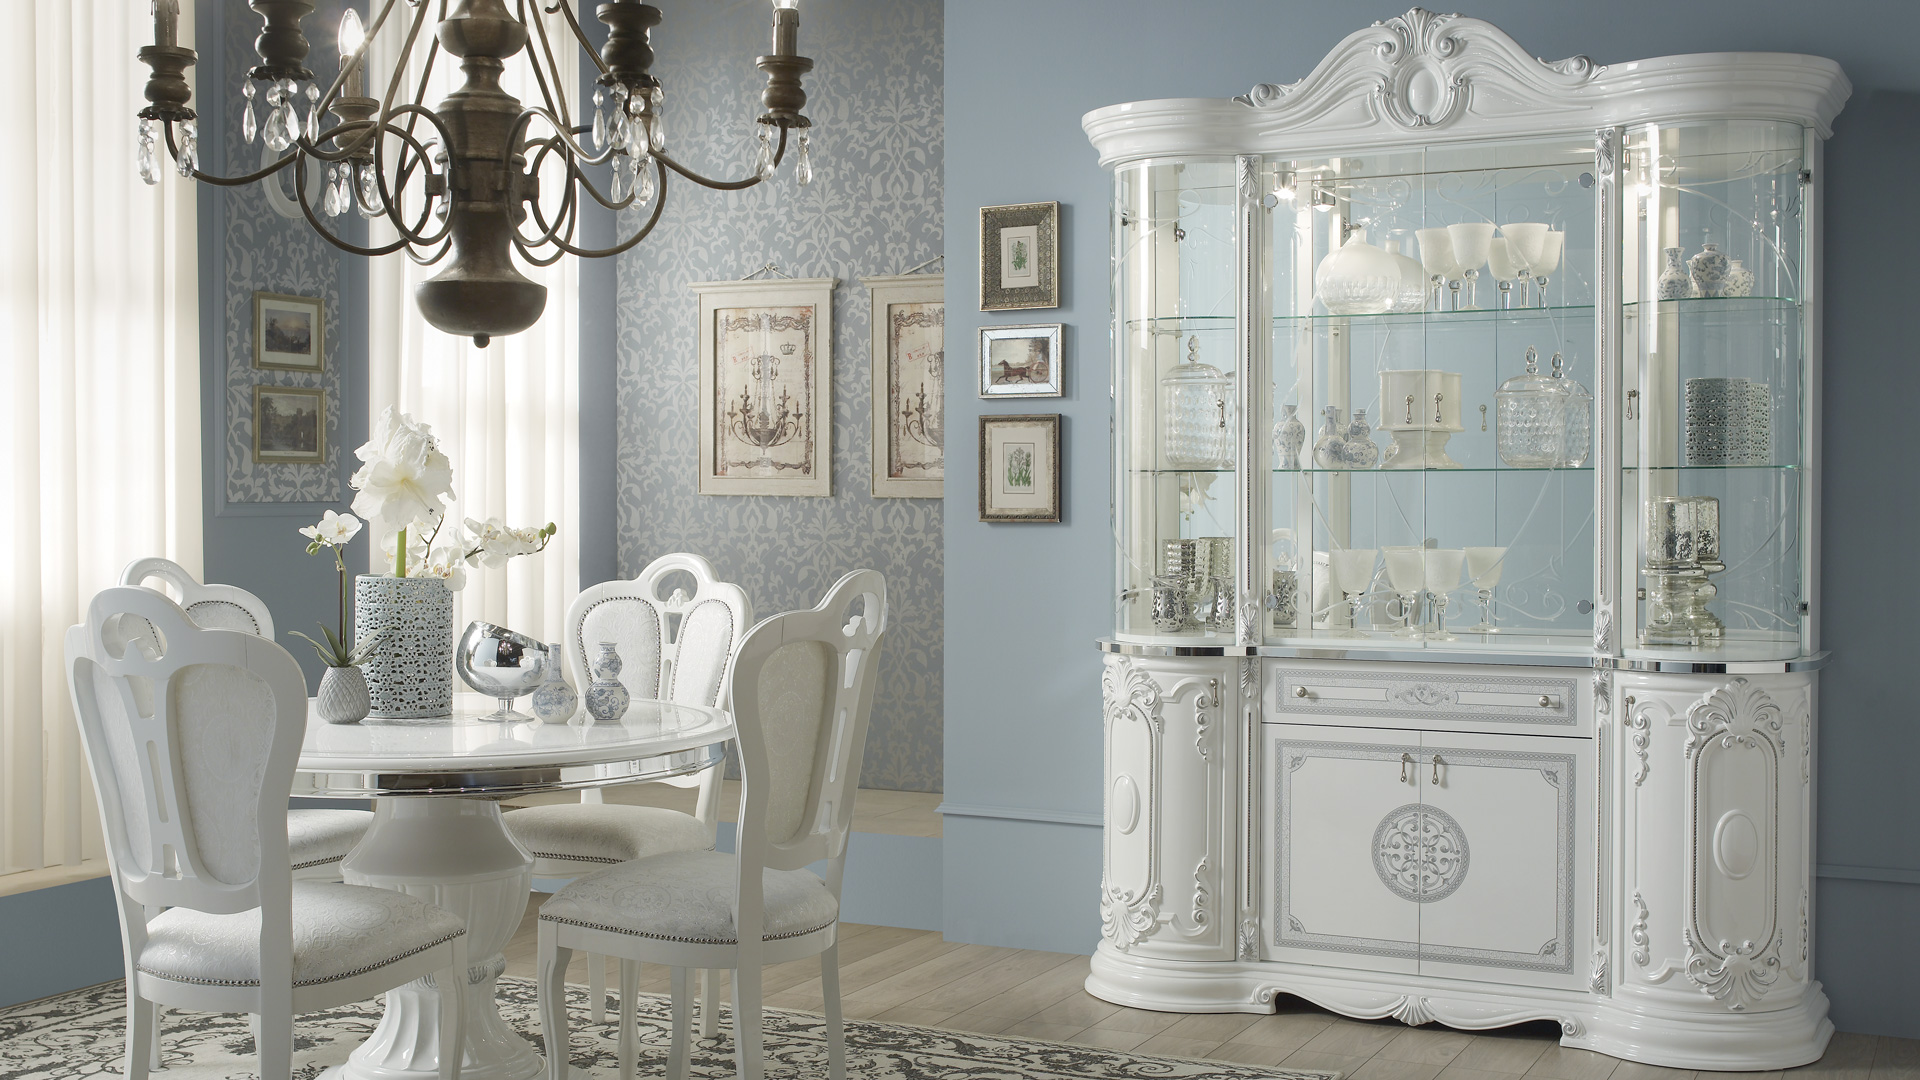 greta giorno klassische esszimmer yuvam m belhaus in wuppertal cilek offizieller h ndler in. Black Bedroom Furniture Sets. Home Design Ideas